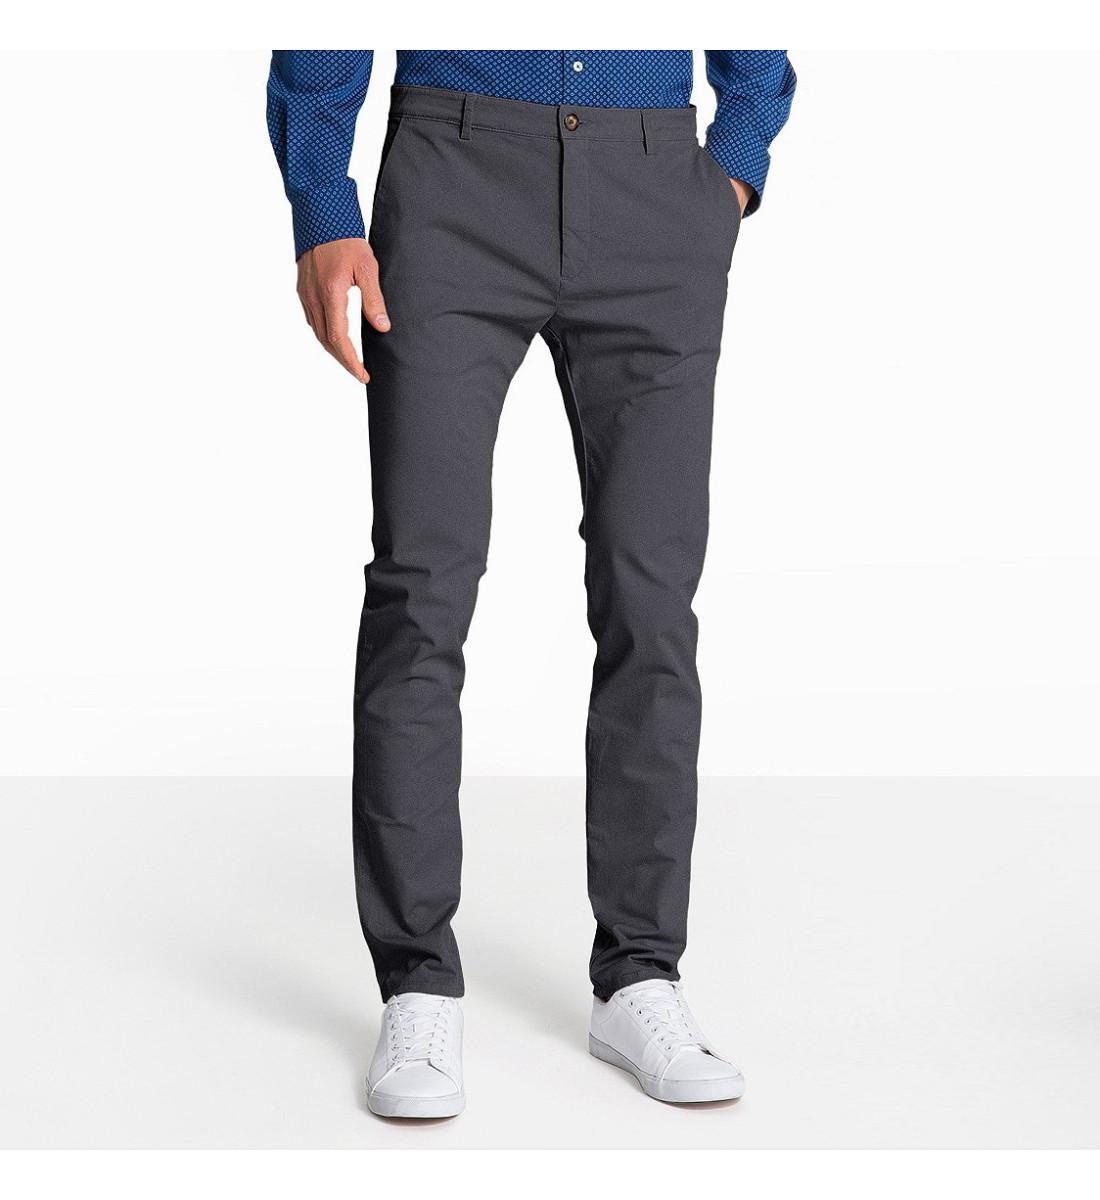 Pantalon CHINO homme Gris